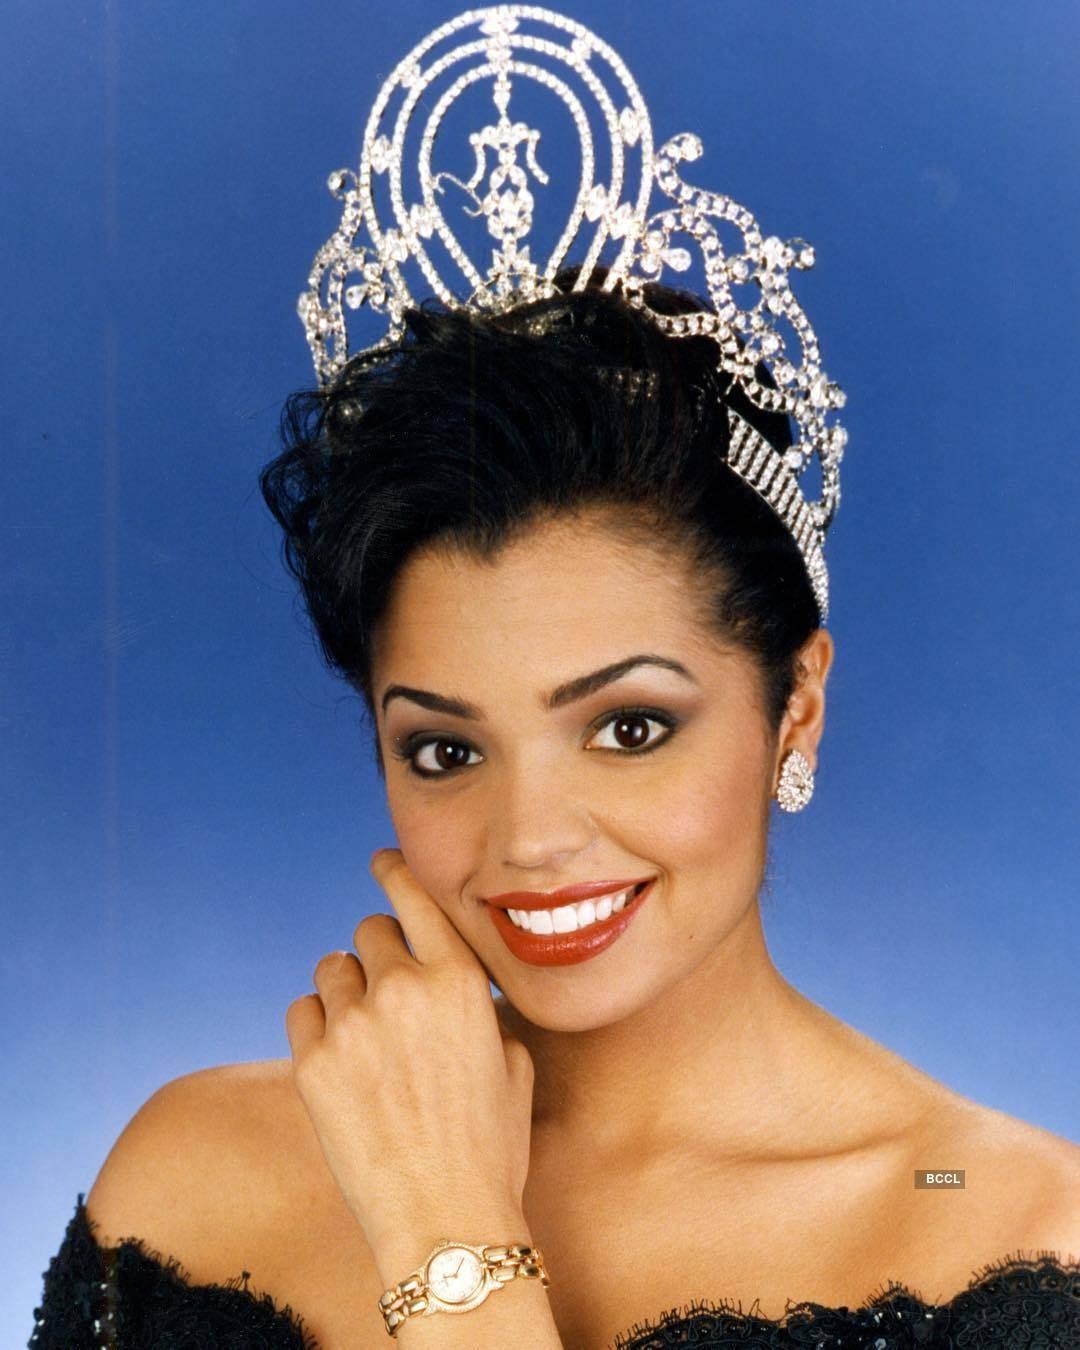 Miss Universe 1995 passes away